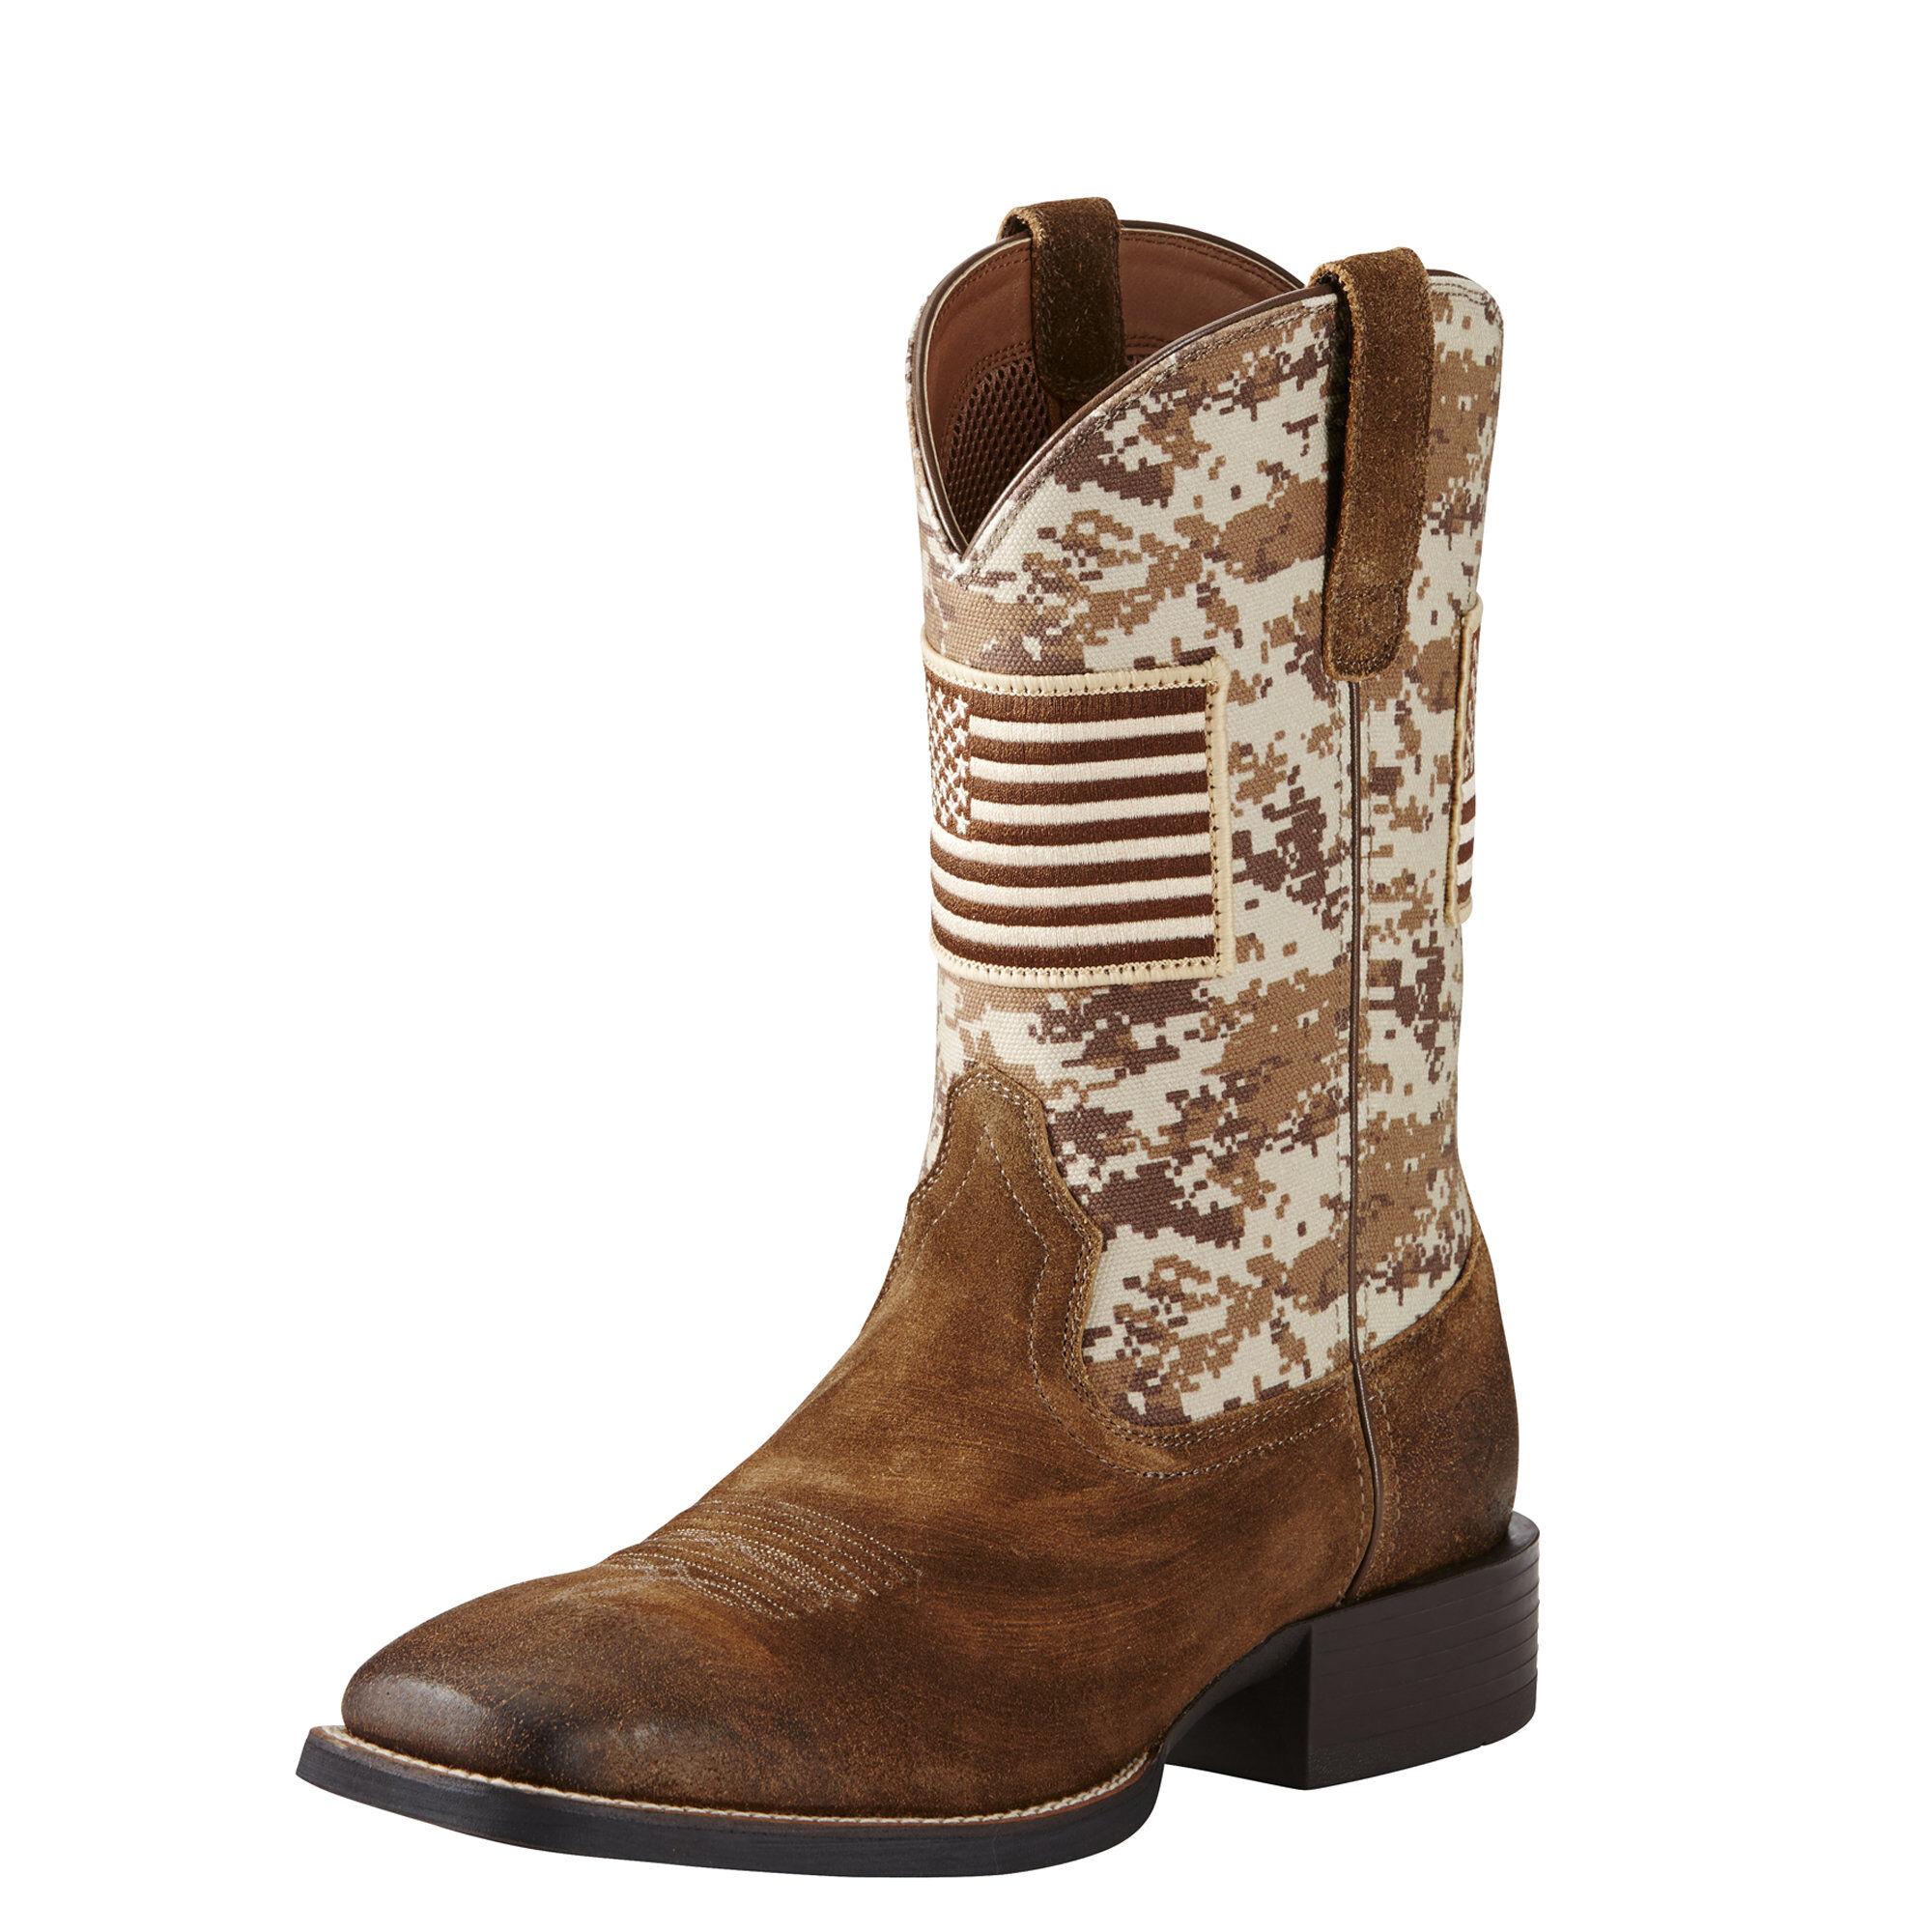 Men's Ariat Sport Patriot Round Toe Cowboy Boot, Size: 13 D, Black Deer tan Leather